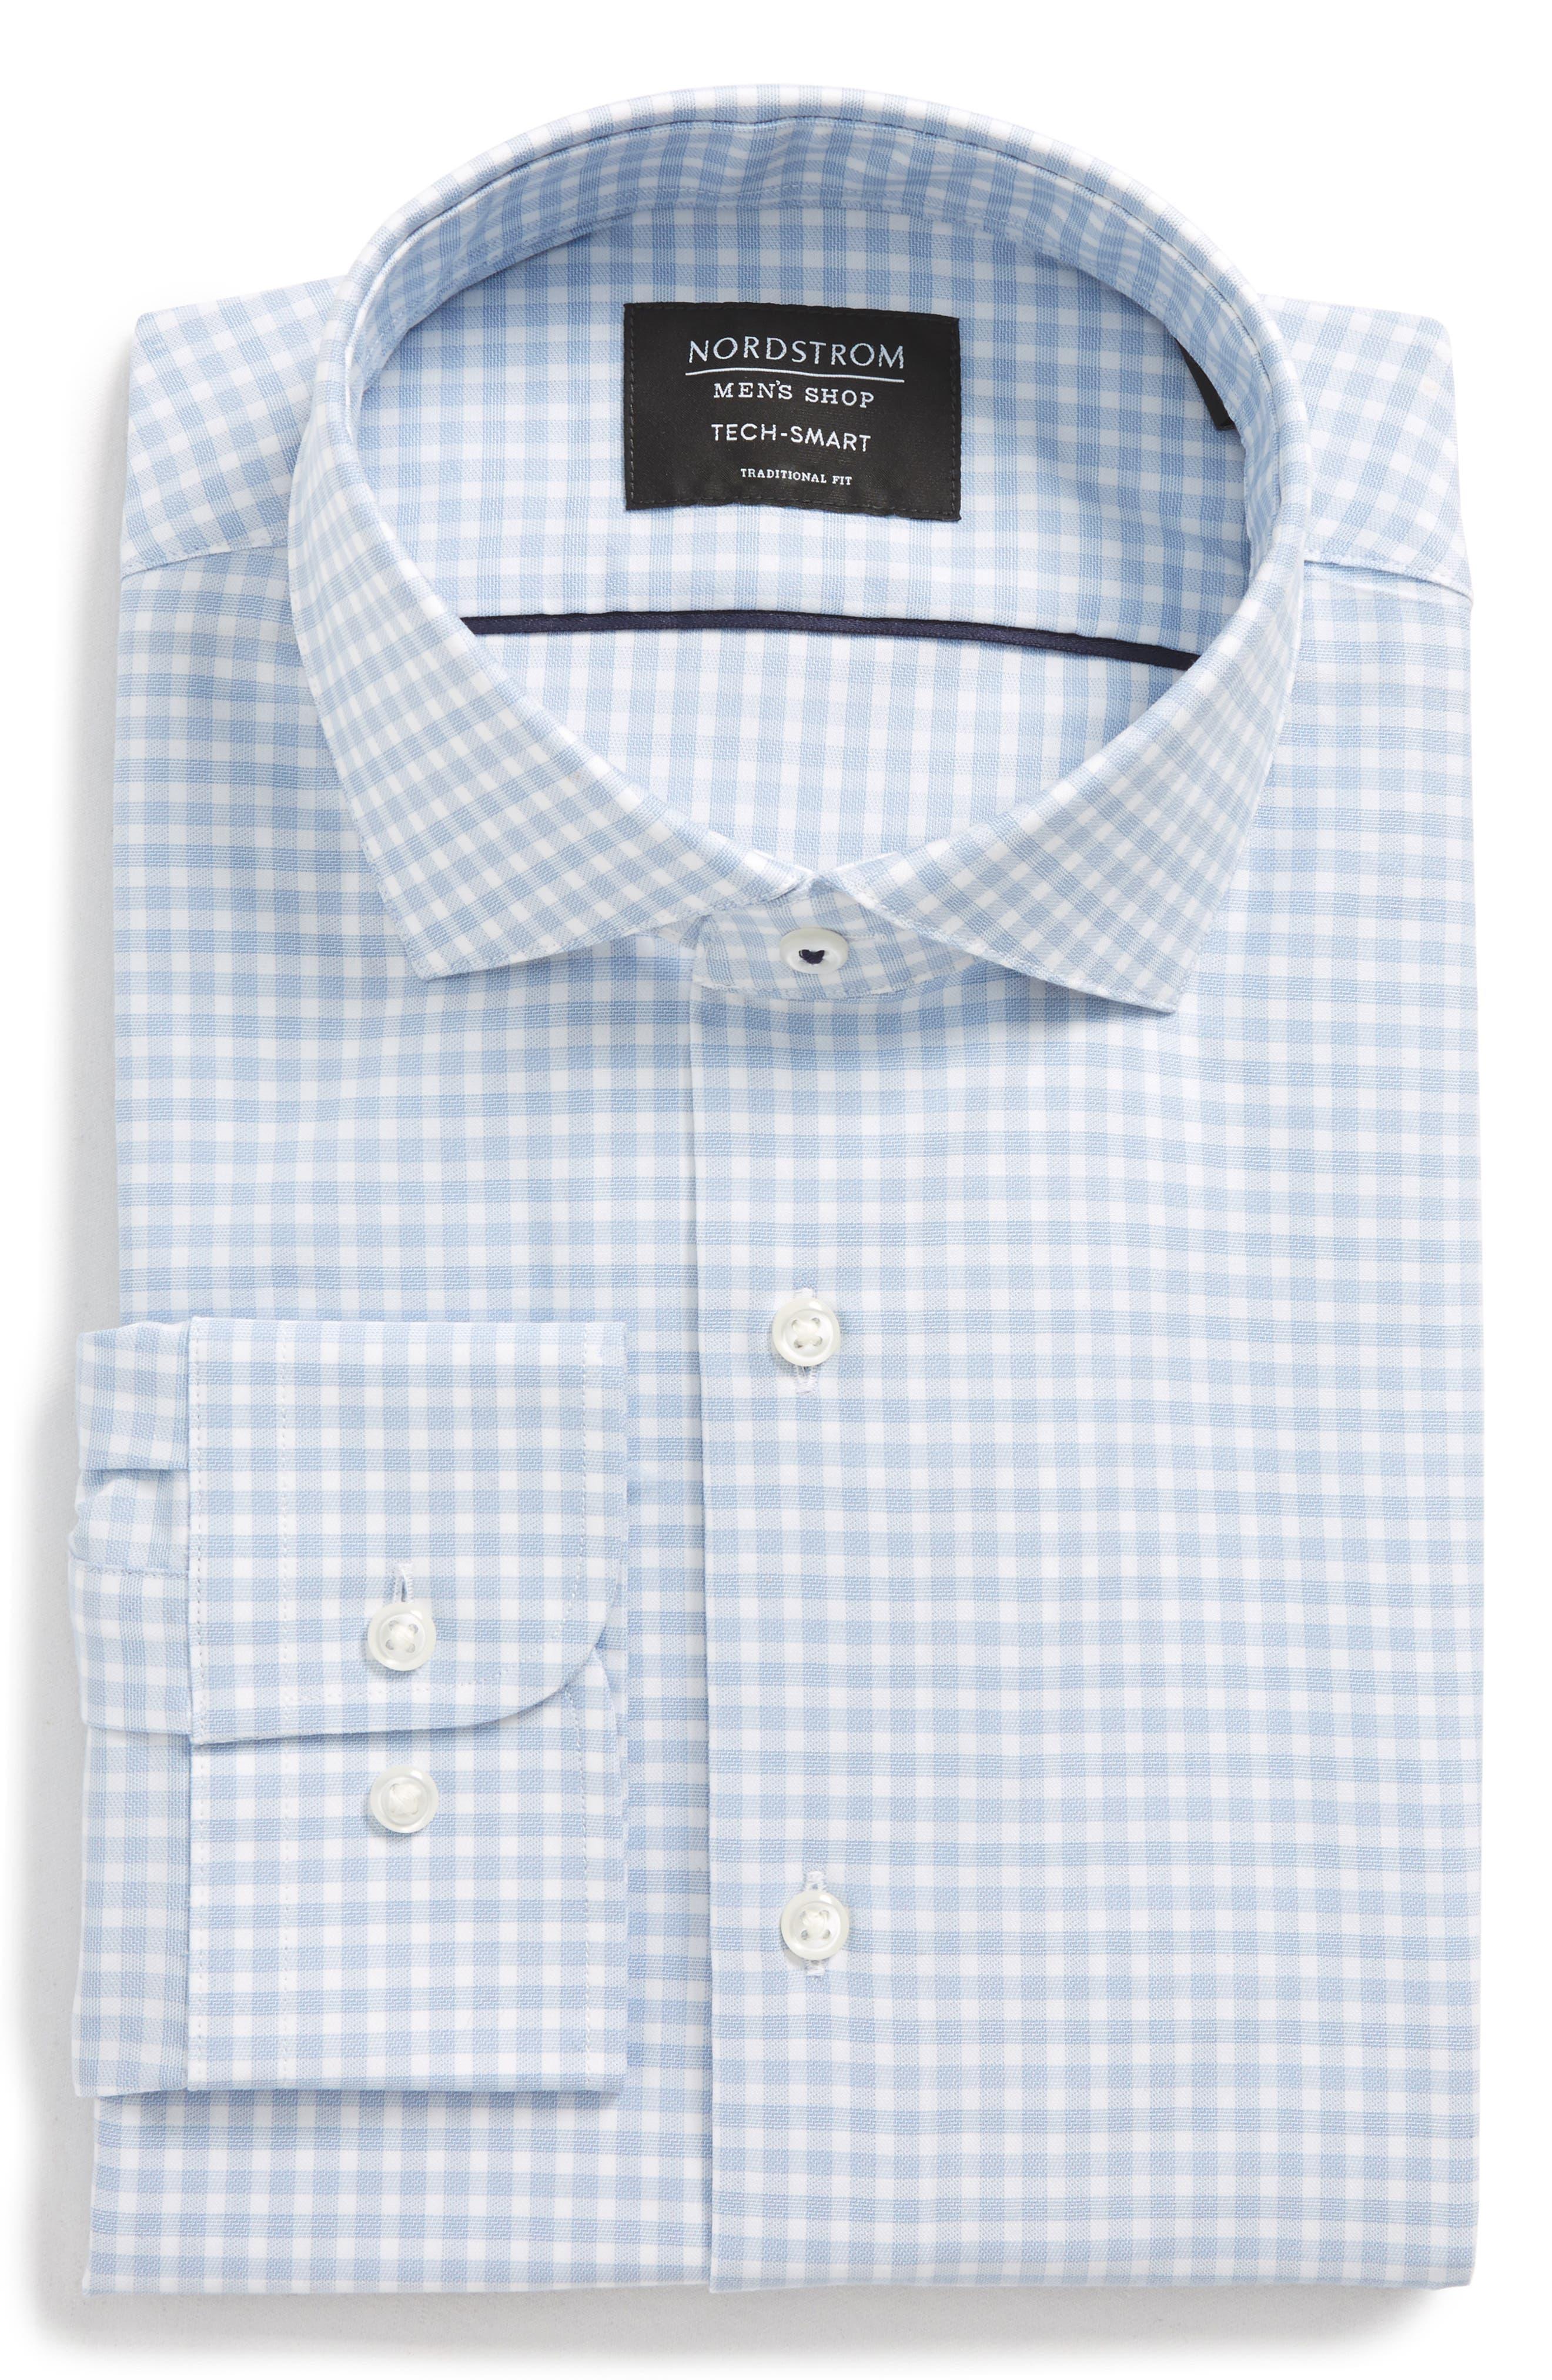 Alternate Image 4  - Nordstrom Men's Shop Tech-Smart Traditional Fit Stretch Check Dress Shirt